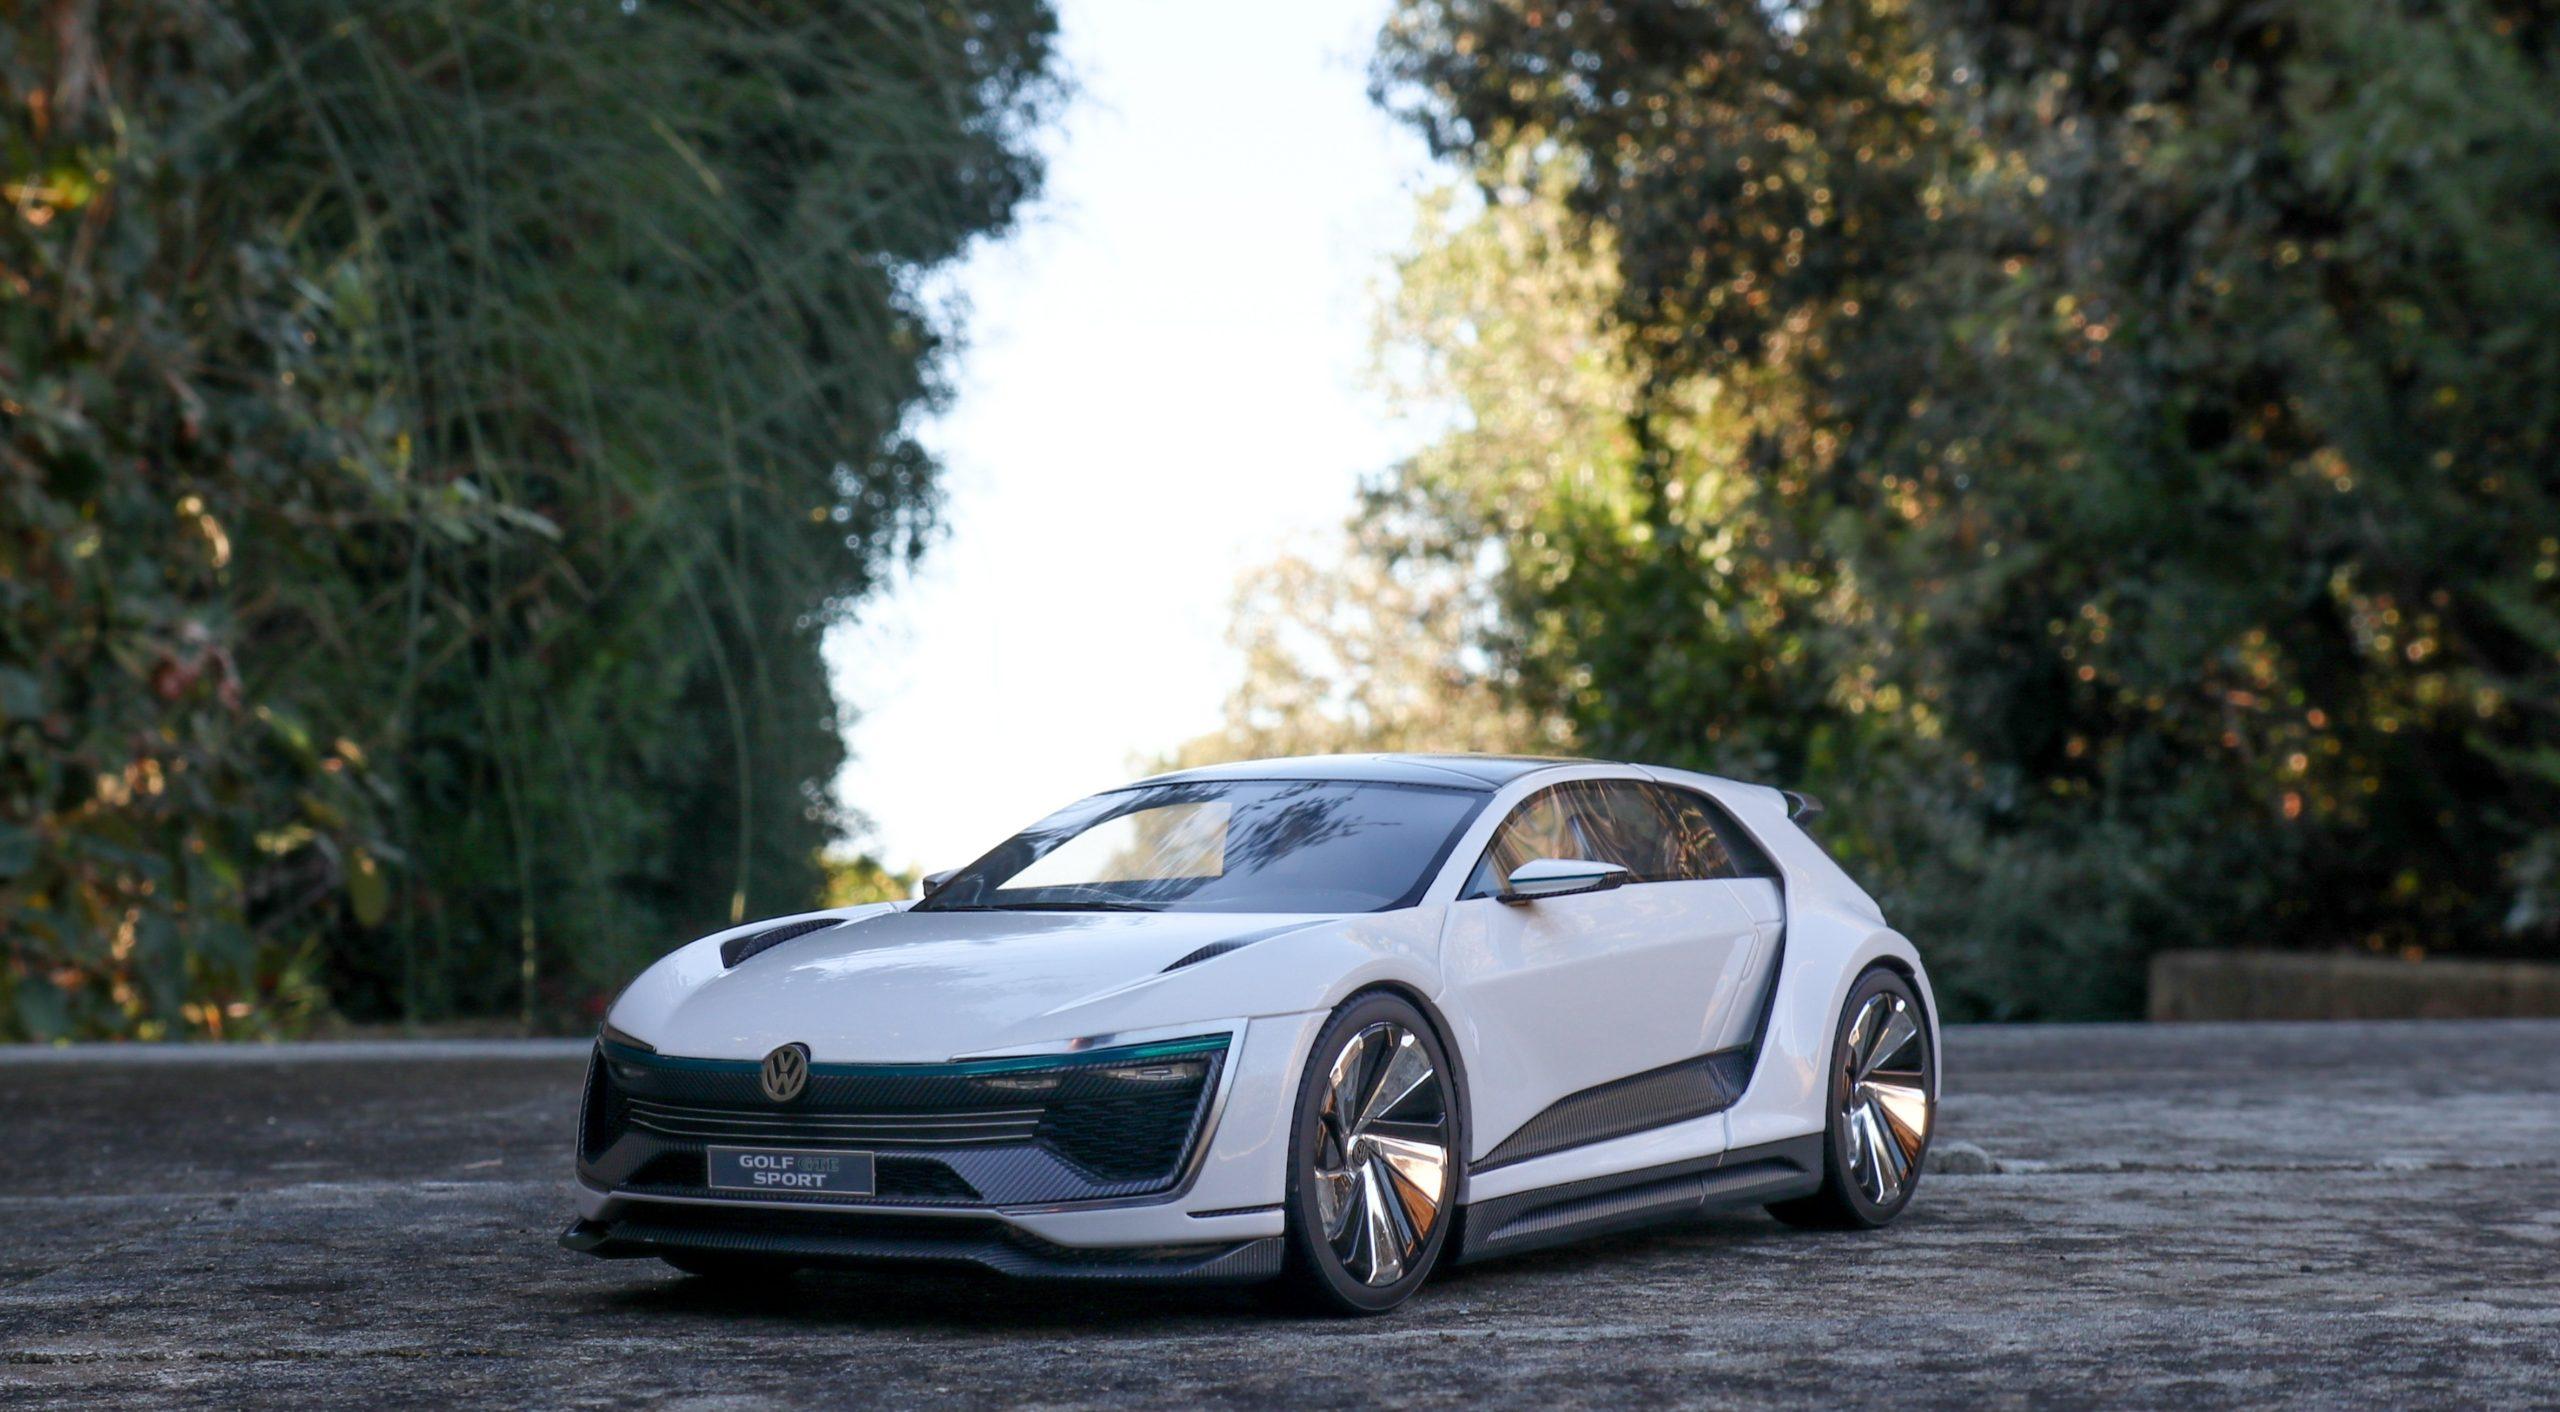 VW Golf GTE Sport Concept DNA Collectibles